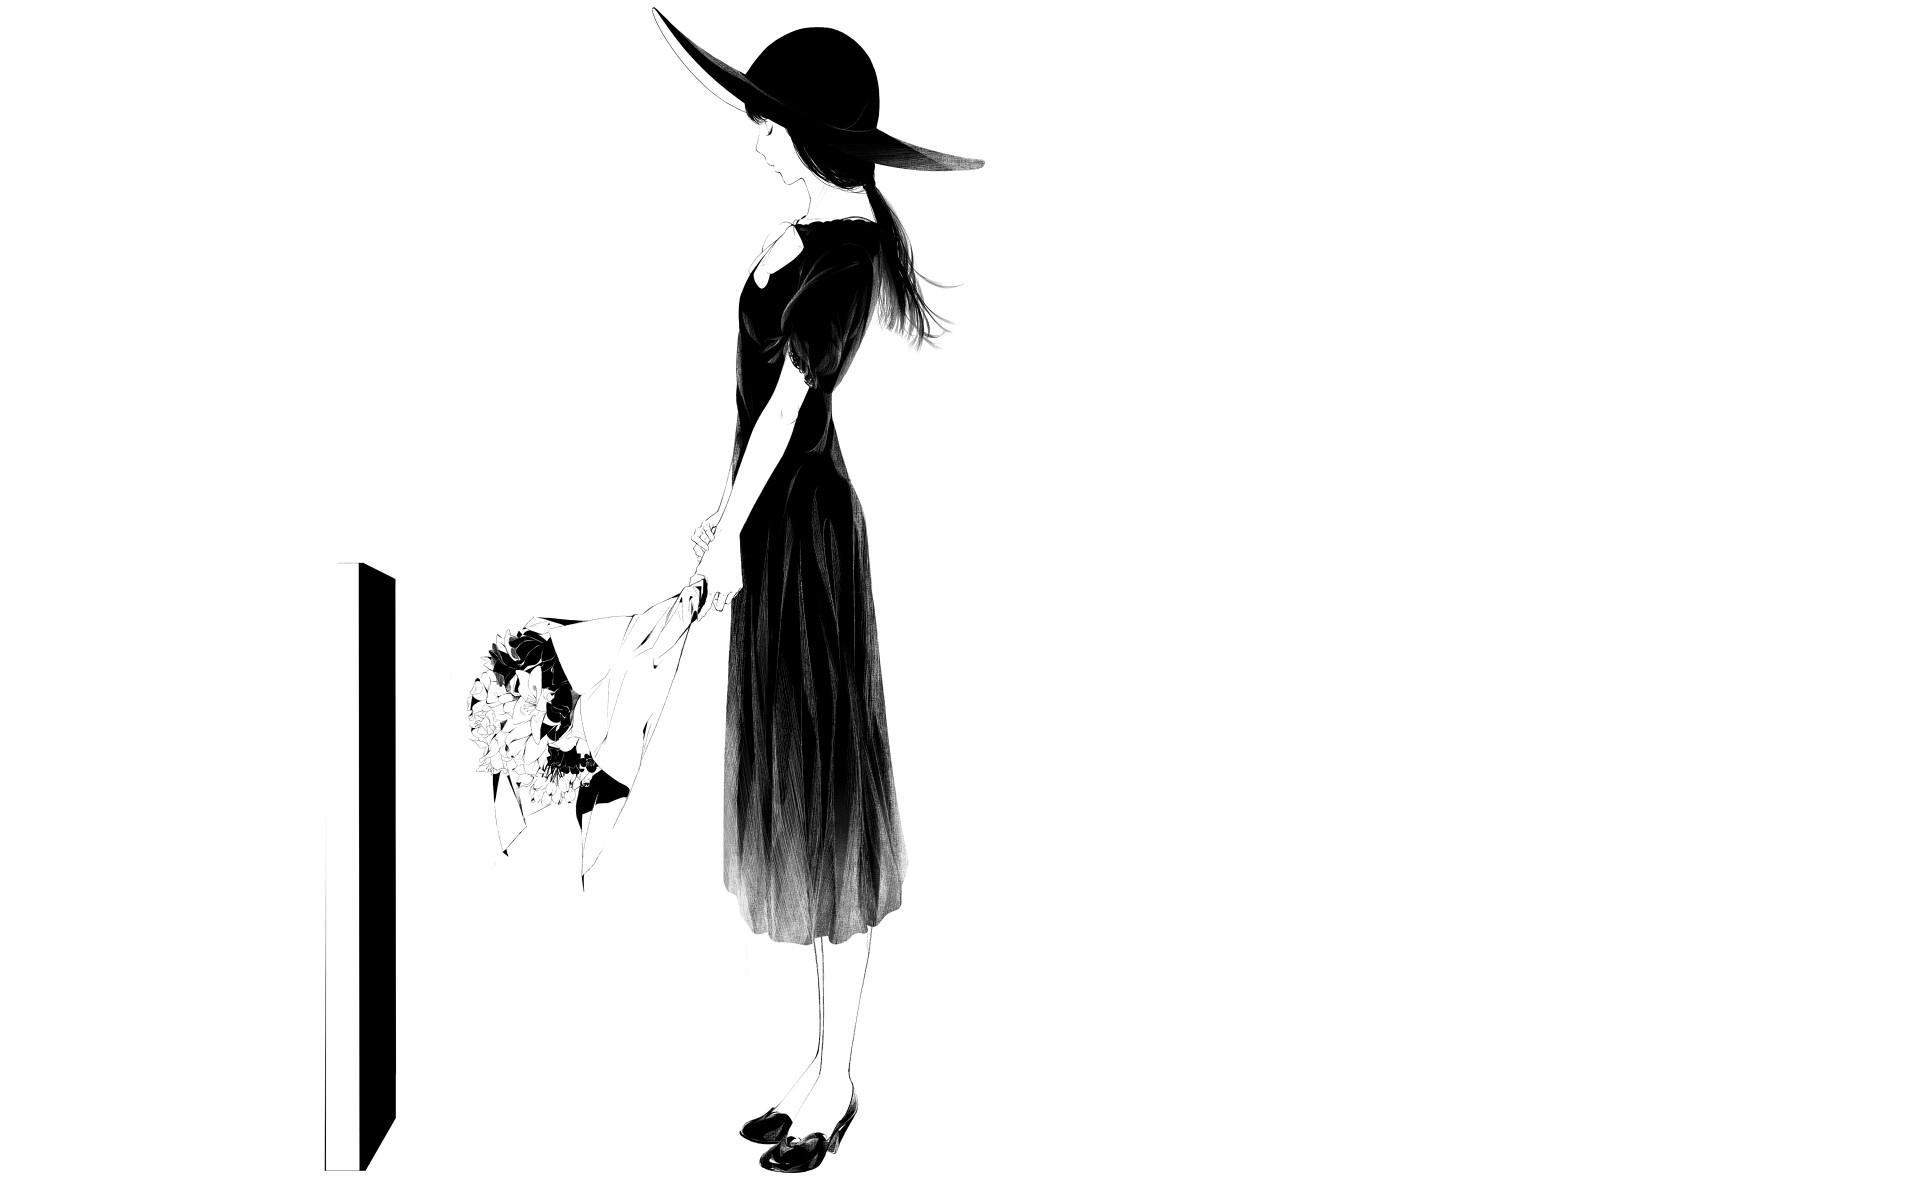 Drawing Illustration Women Monochrome Simple Background Flowers Hat Artwork White Cartoon Sketch Costume Design Fashion